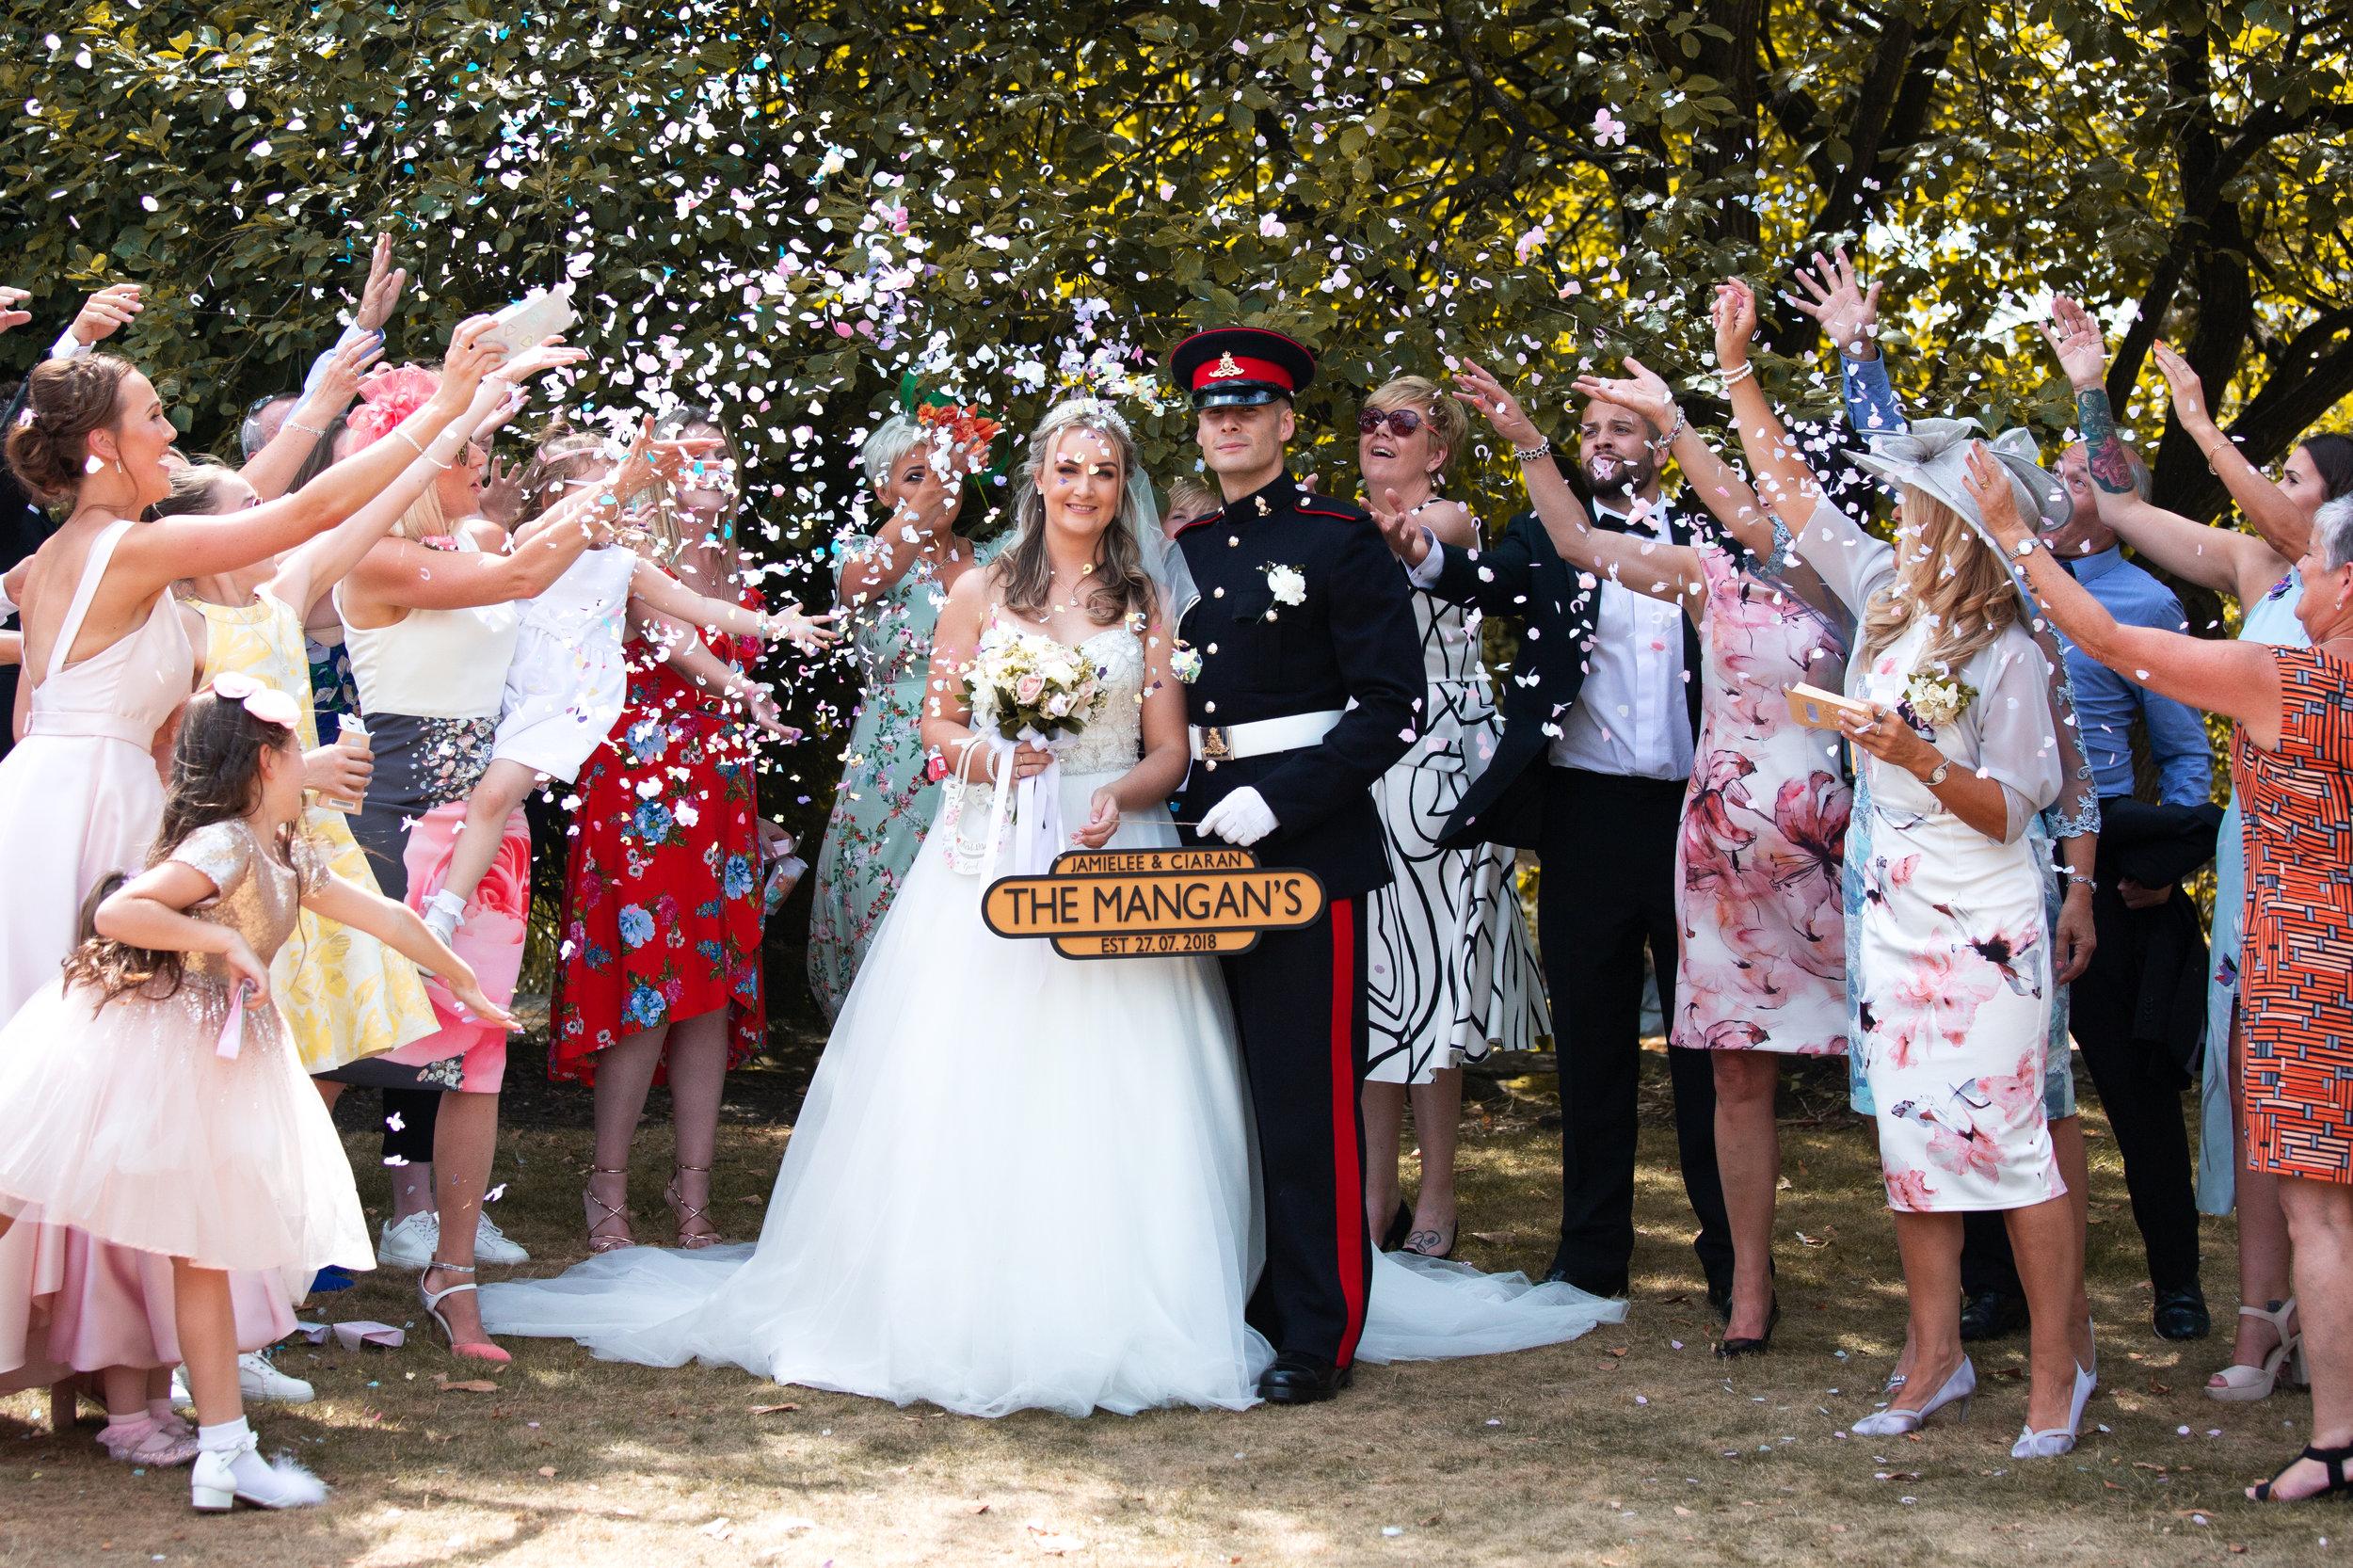 wedding-lea-cooper-photography-willenhall-west-midlands-wolverhampton-dudley-birmingham-uk-marriage-hadley-park-east-telford-confetti-shot.jpg